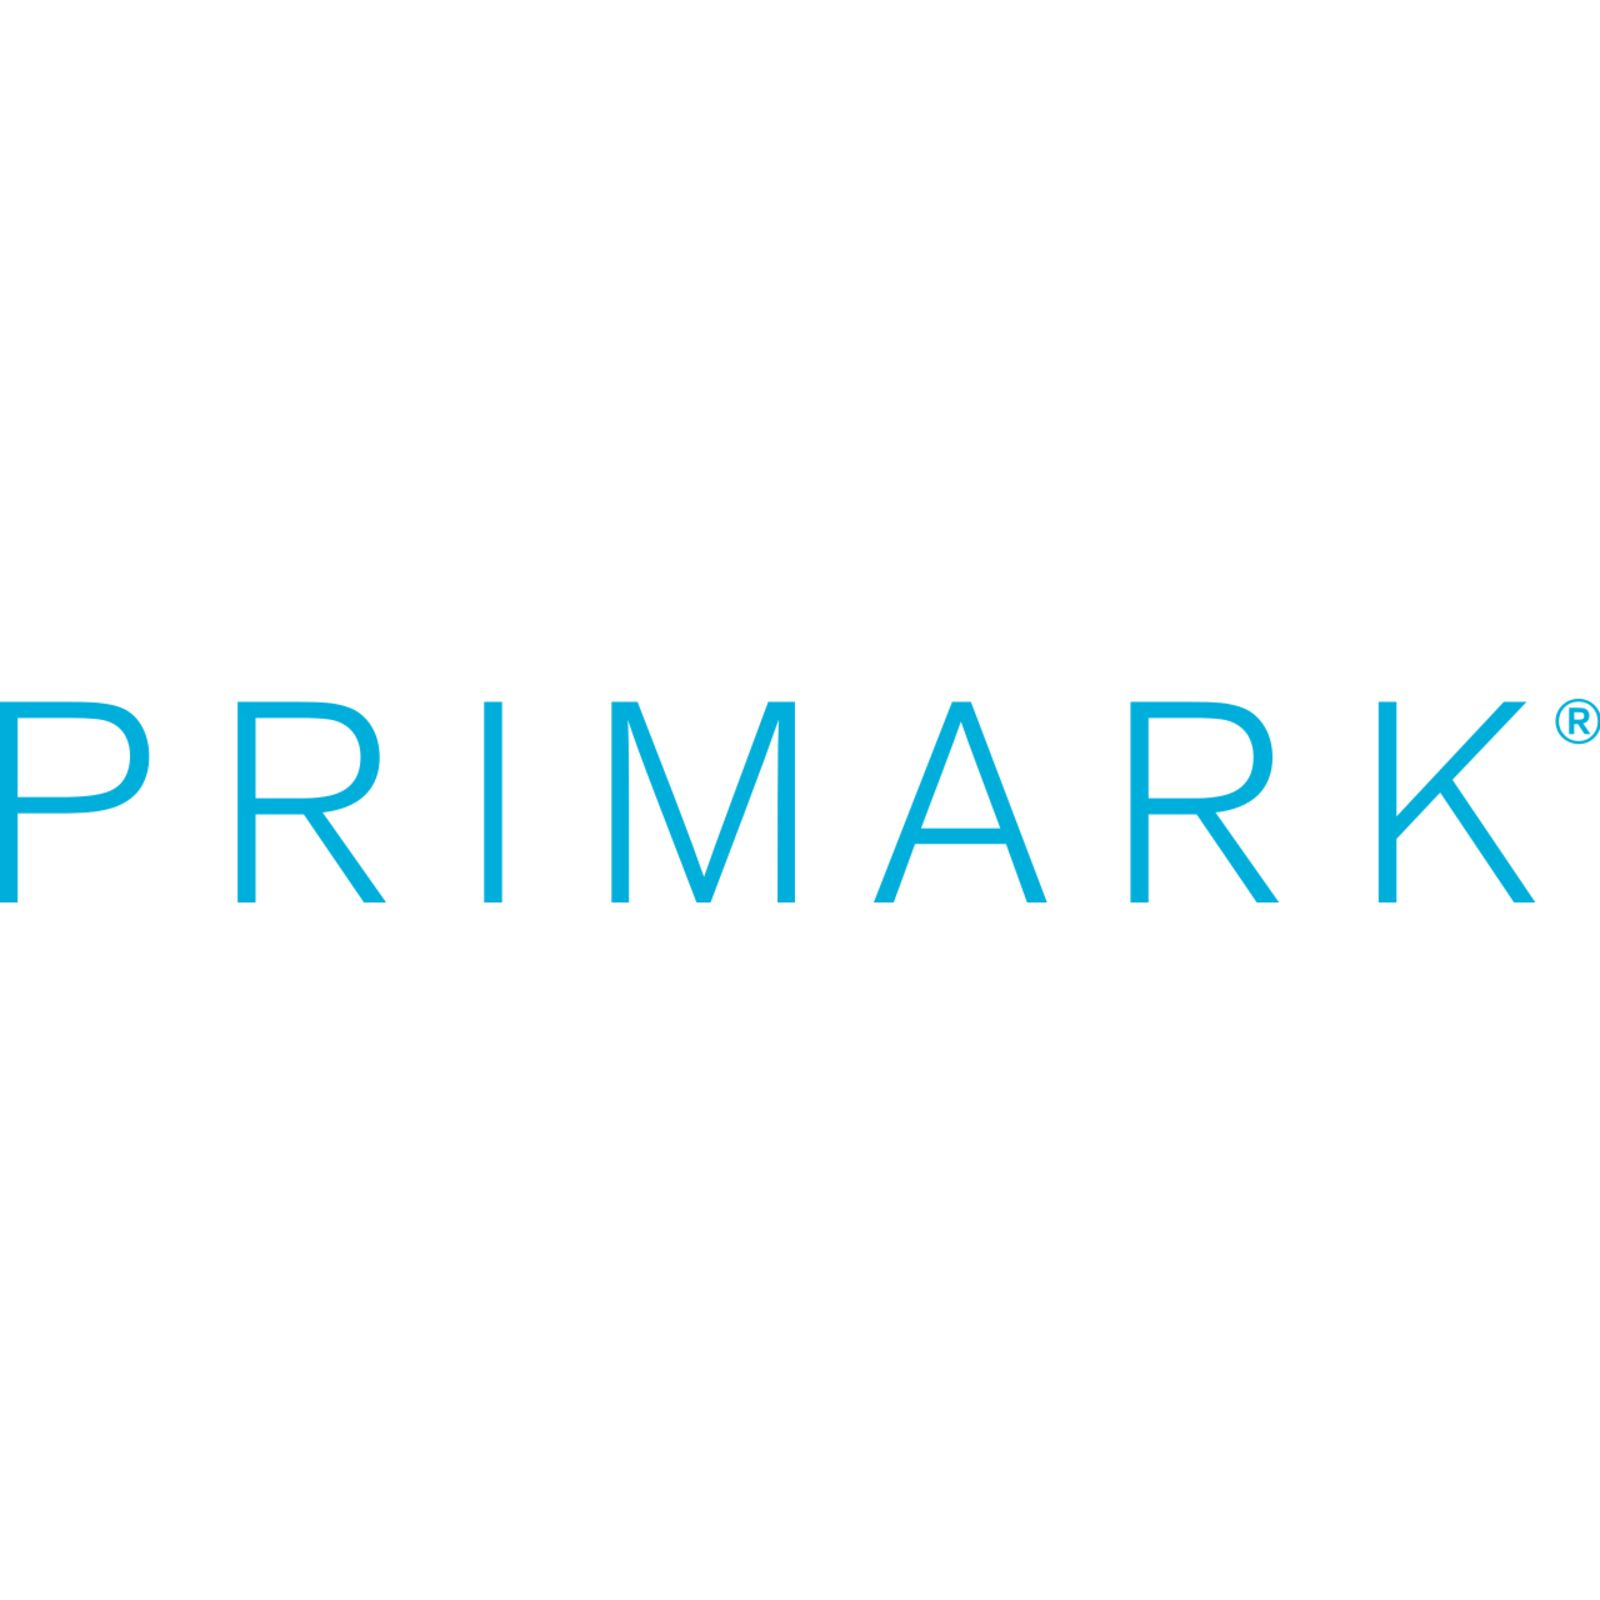 PRIMARK (Image 1)